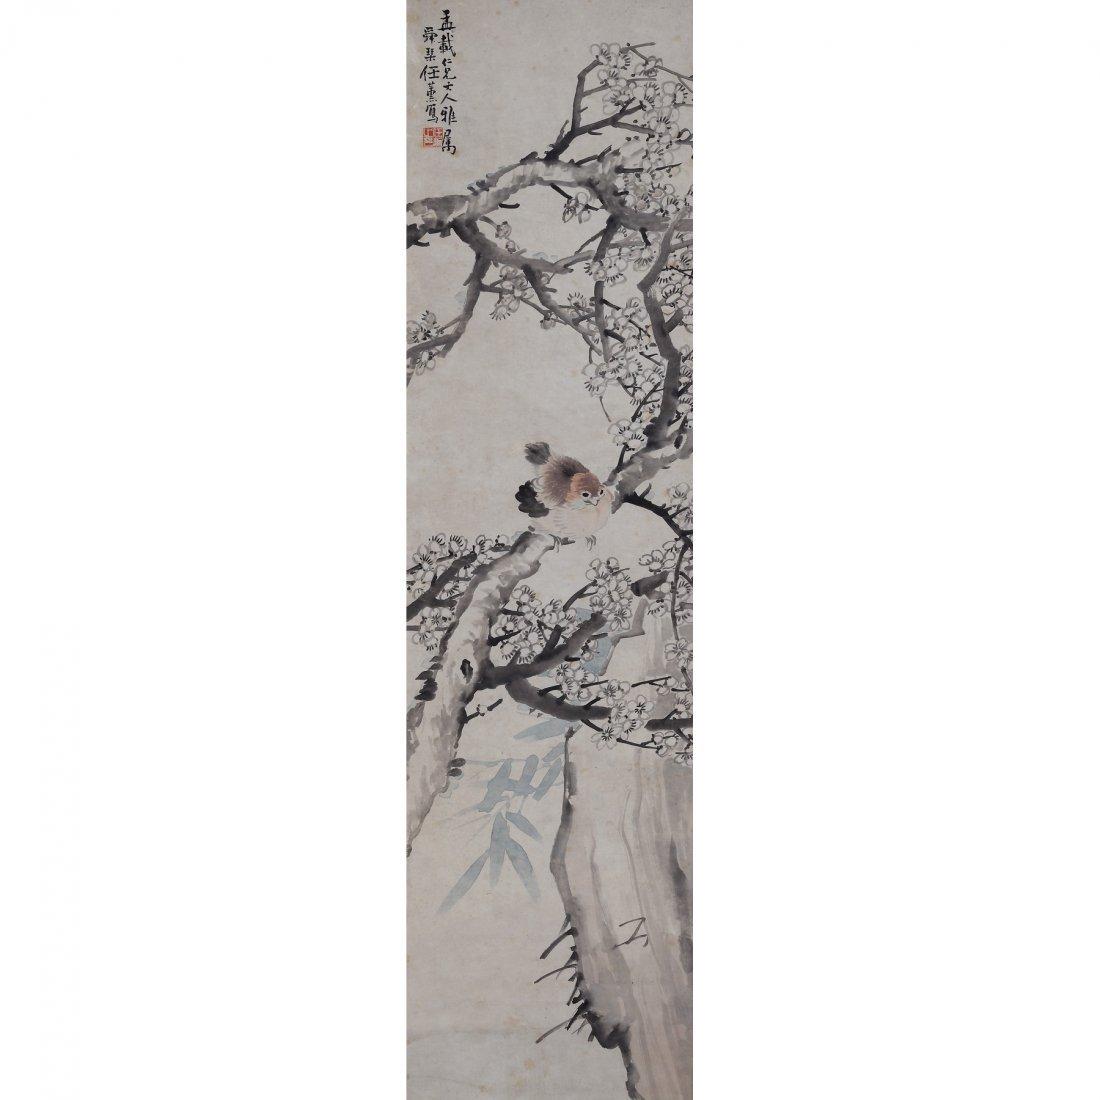 PLUM BLOSSOMS AND THE BIRD BY REN XUN (1835-1893)